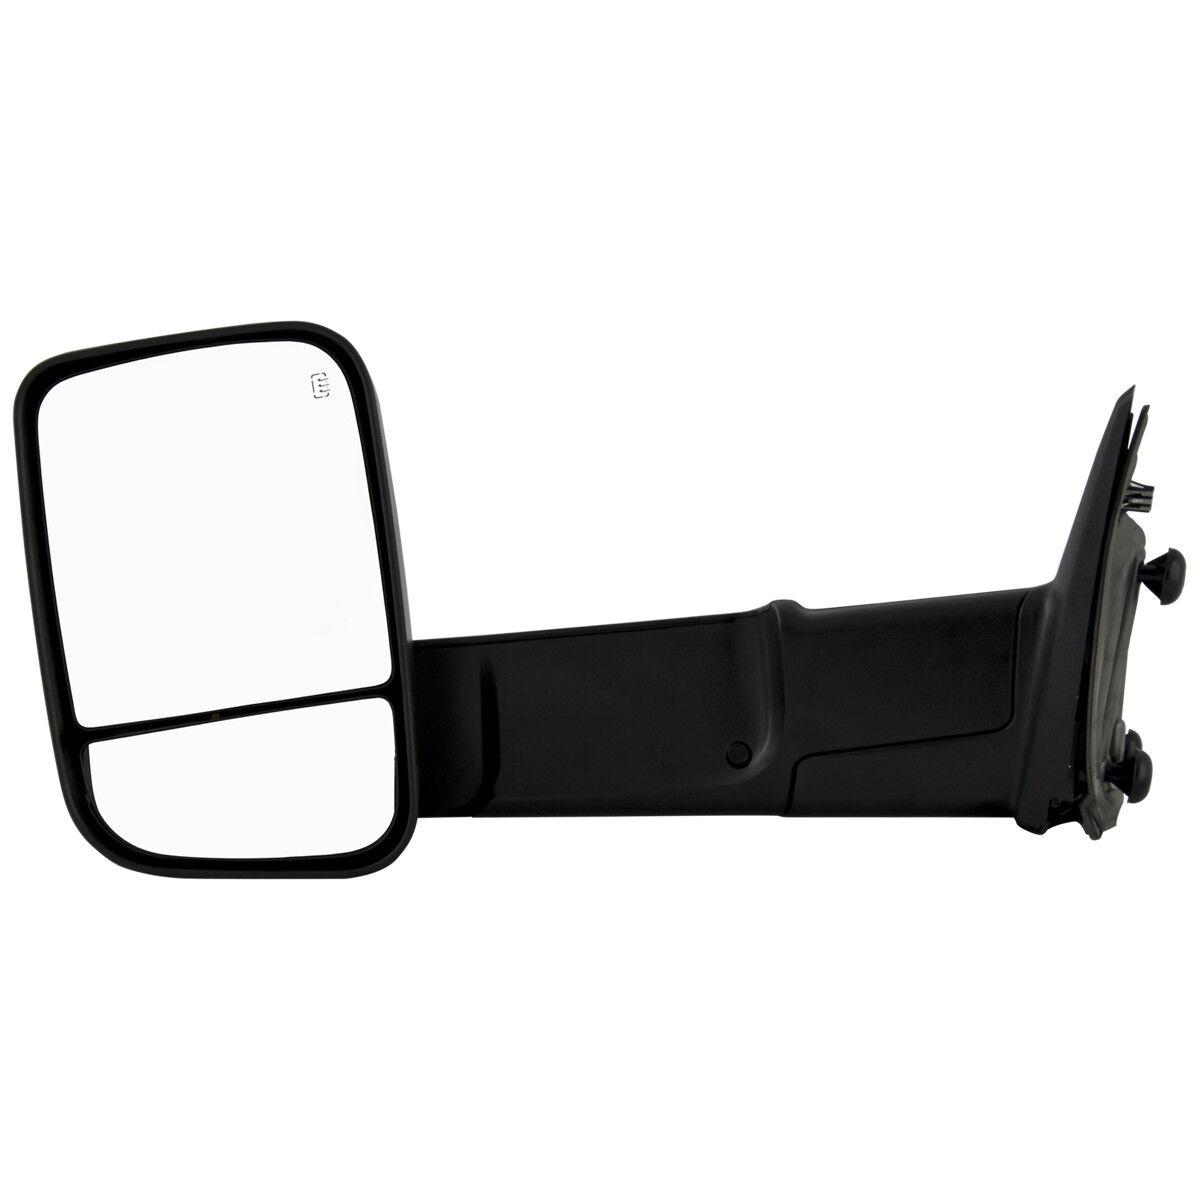 CH1320315 Driver Side Mirror For Dodge Ram//Ram Trucks 2009-2012 New CH1320303